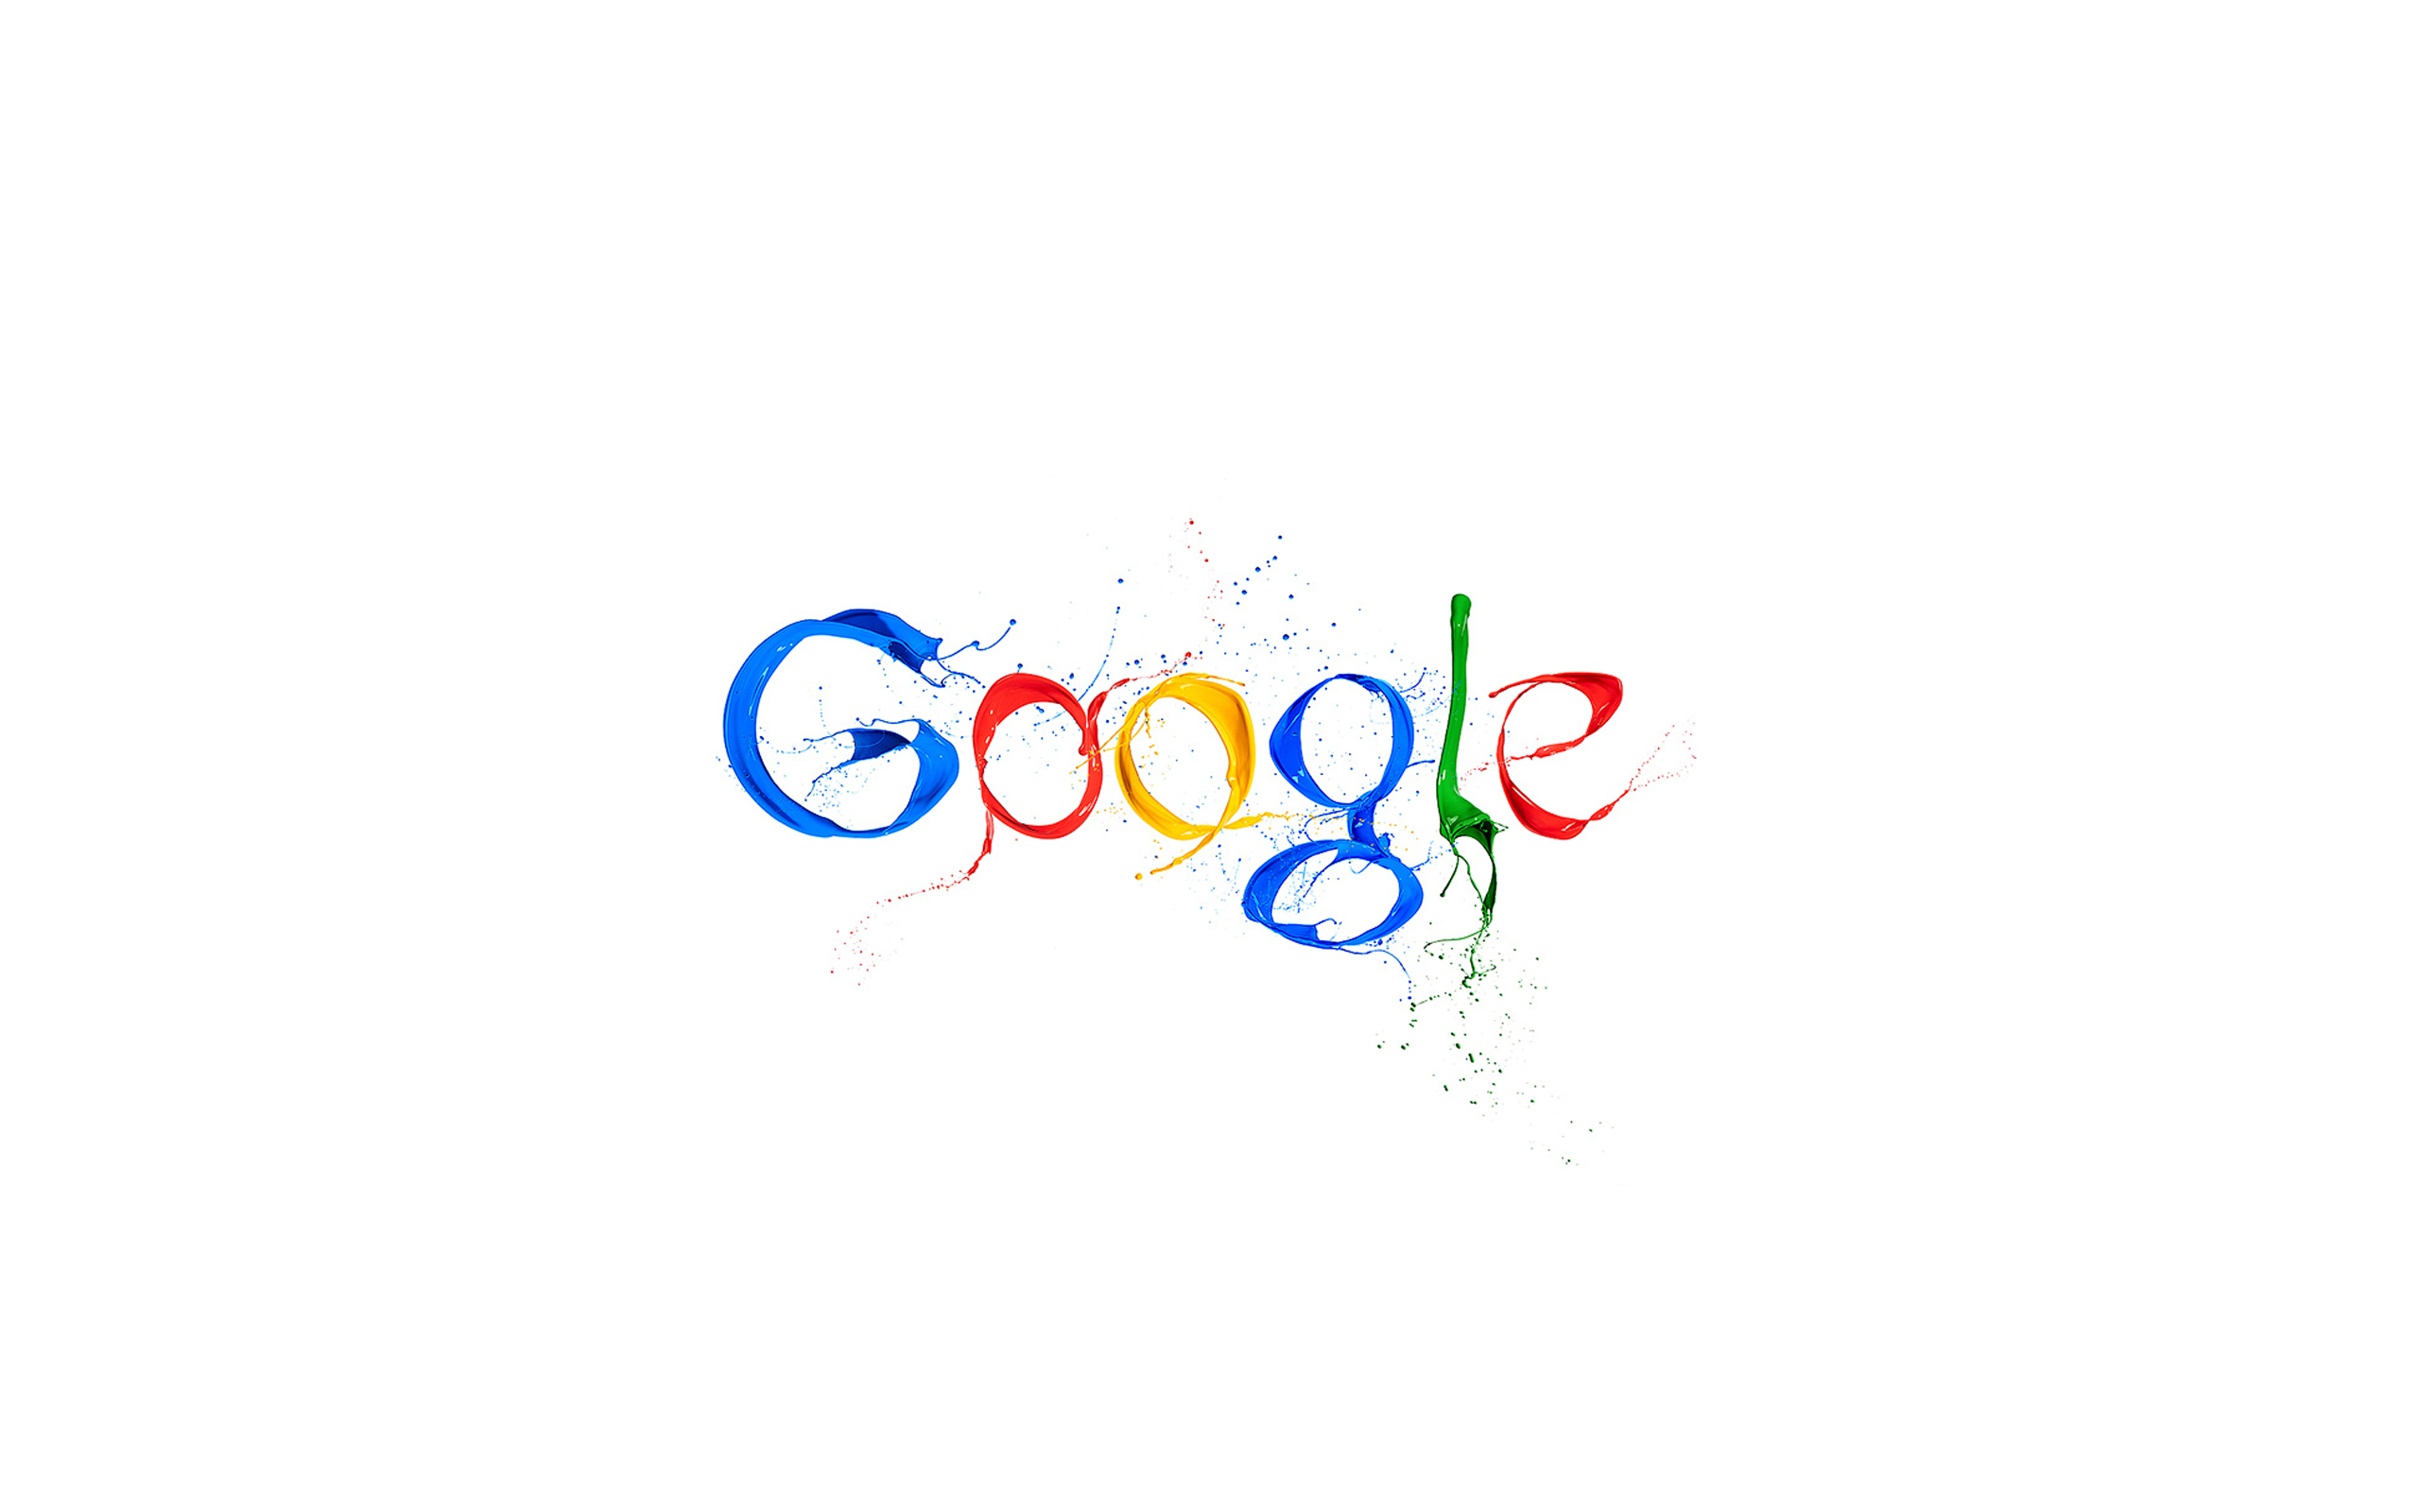 Google Paint Splash wallpapers Google Paint Splash stock photos 2560x1600